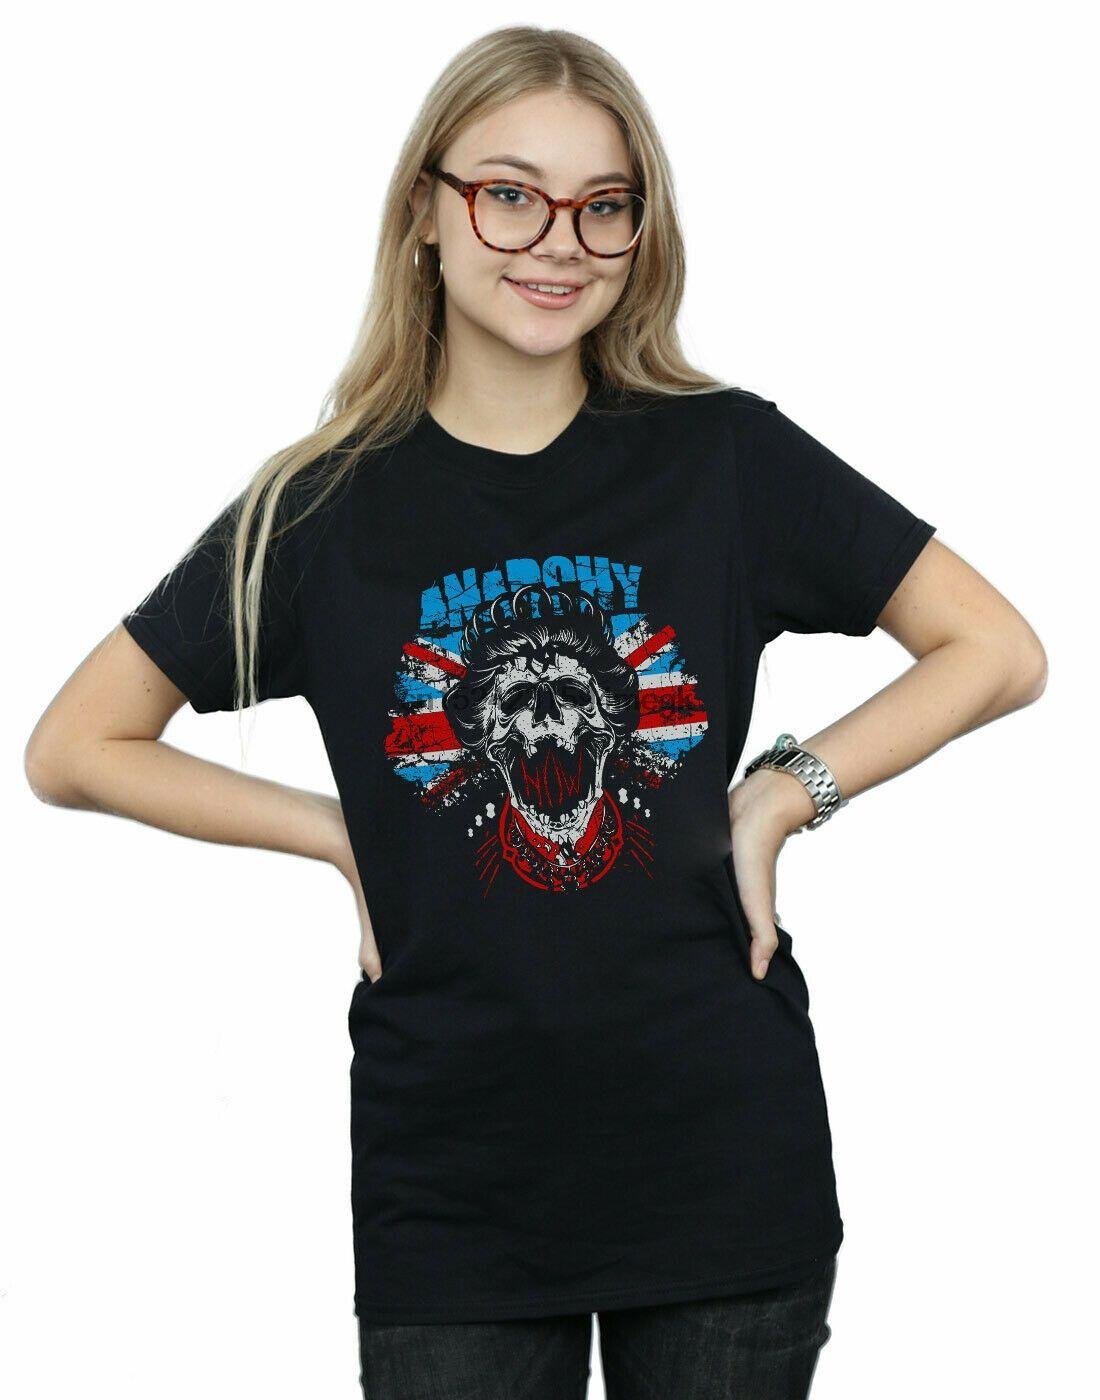 Drewbacca Anarchy Now Friend O Neck T Shirt Boyfriend Fit Women Fashion